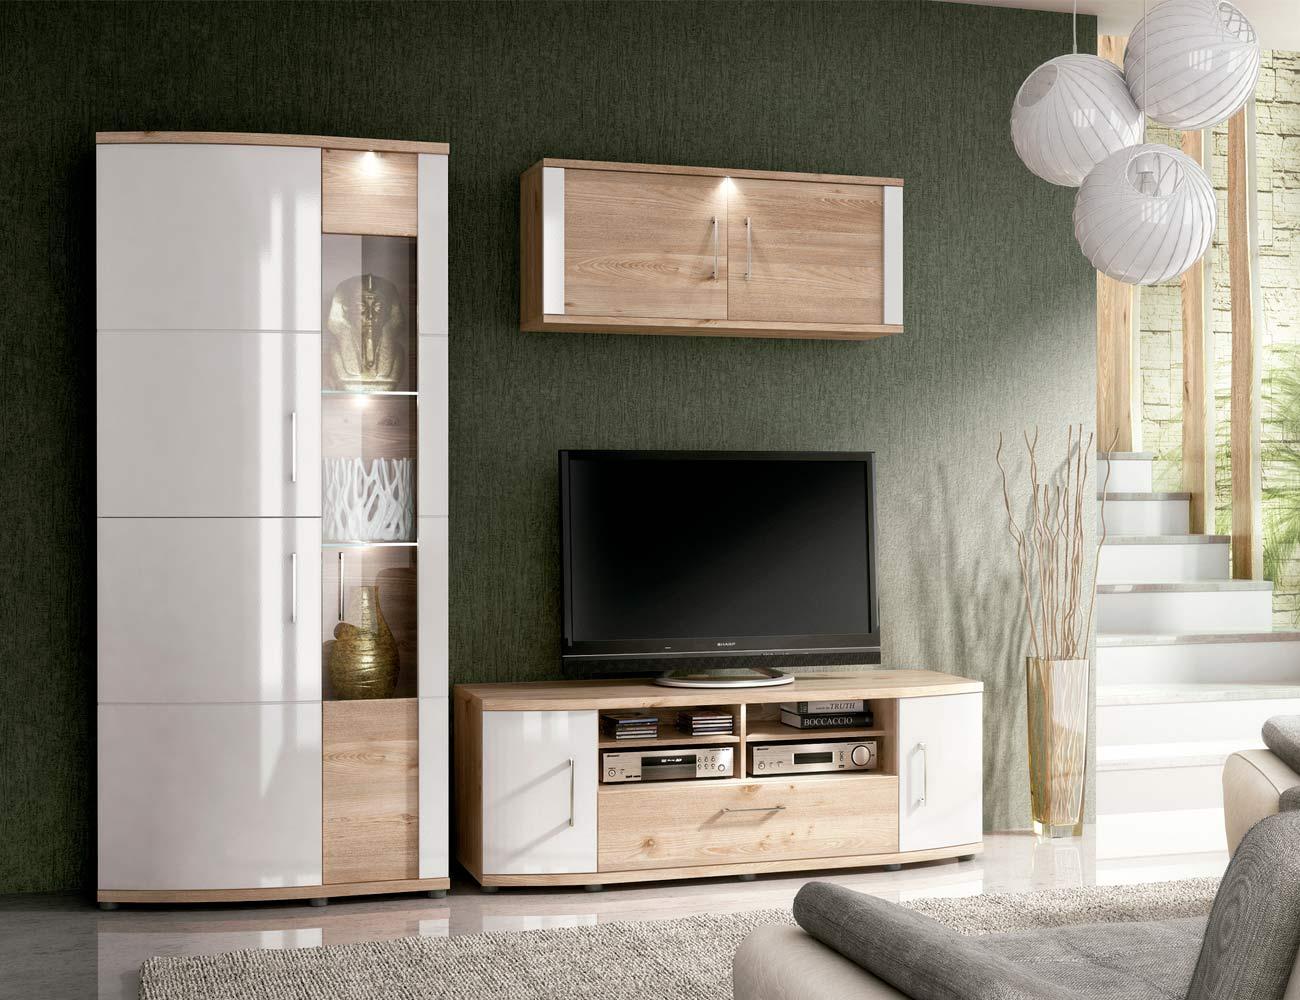 Ambiente3 mueble salon comedor vitrina bodeguero bajo tv alto 2 puertas nelson blanco